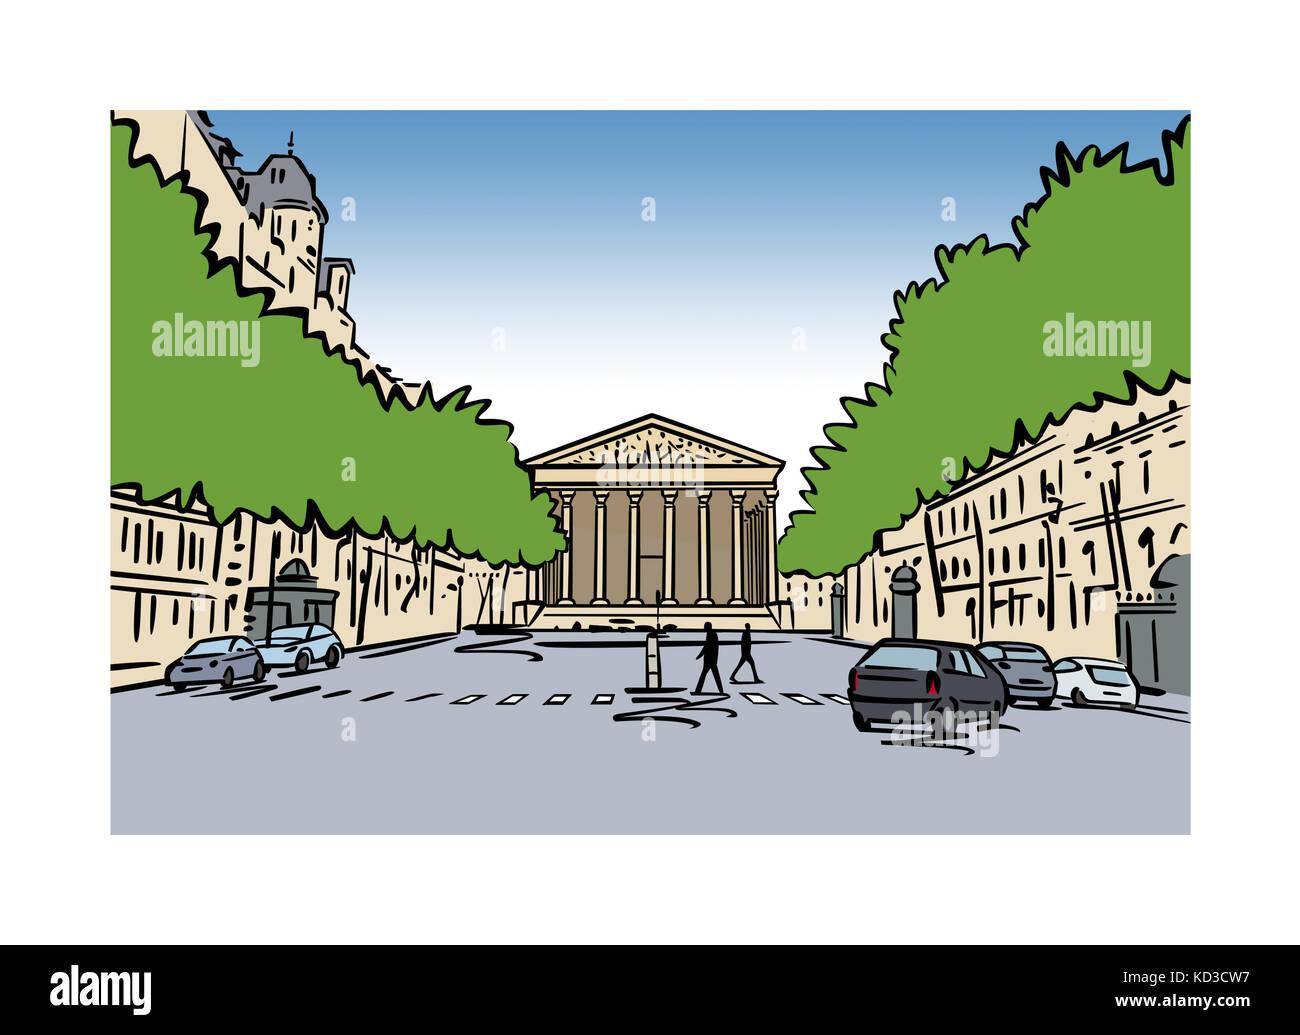 Illustration of La Madeleine, Paris, France Stock Photo